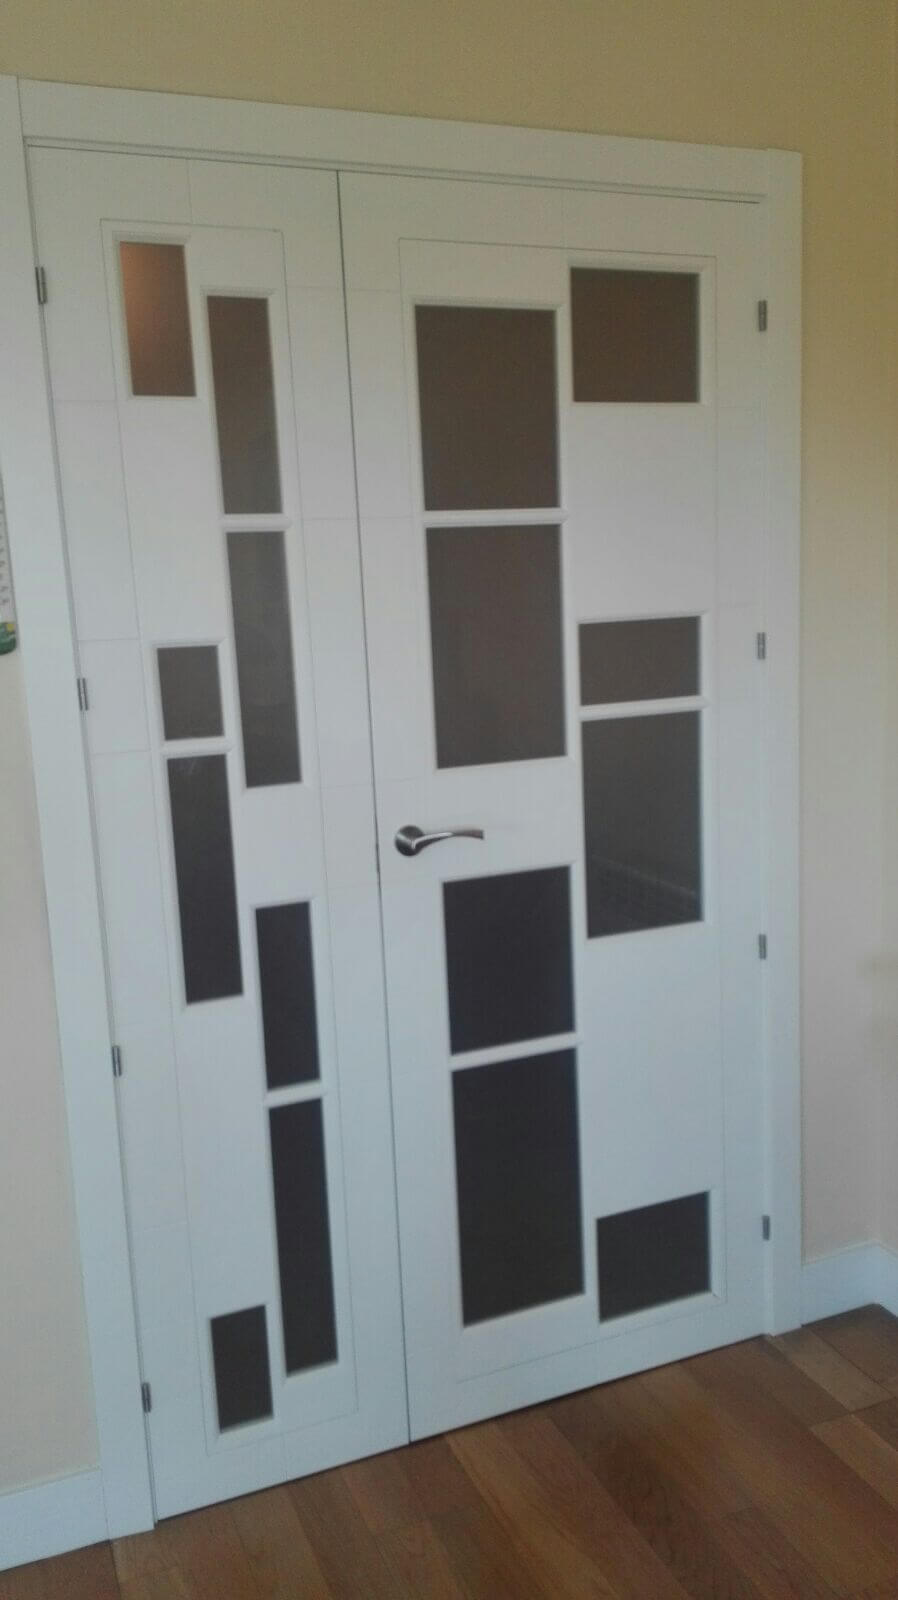 Puertas interior baratas puertas blindadas baratas con for Puertas interior baratas madrid